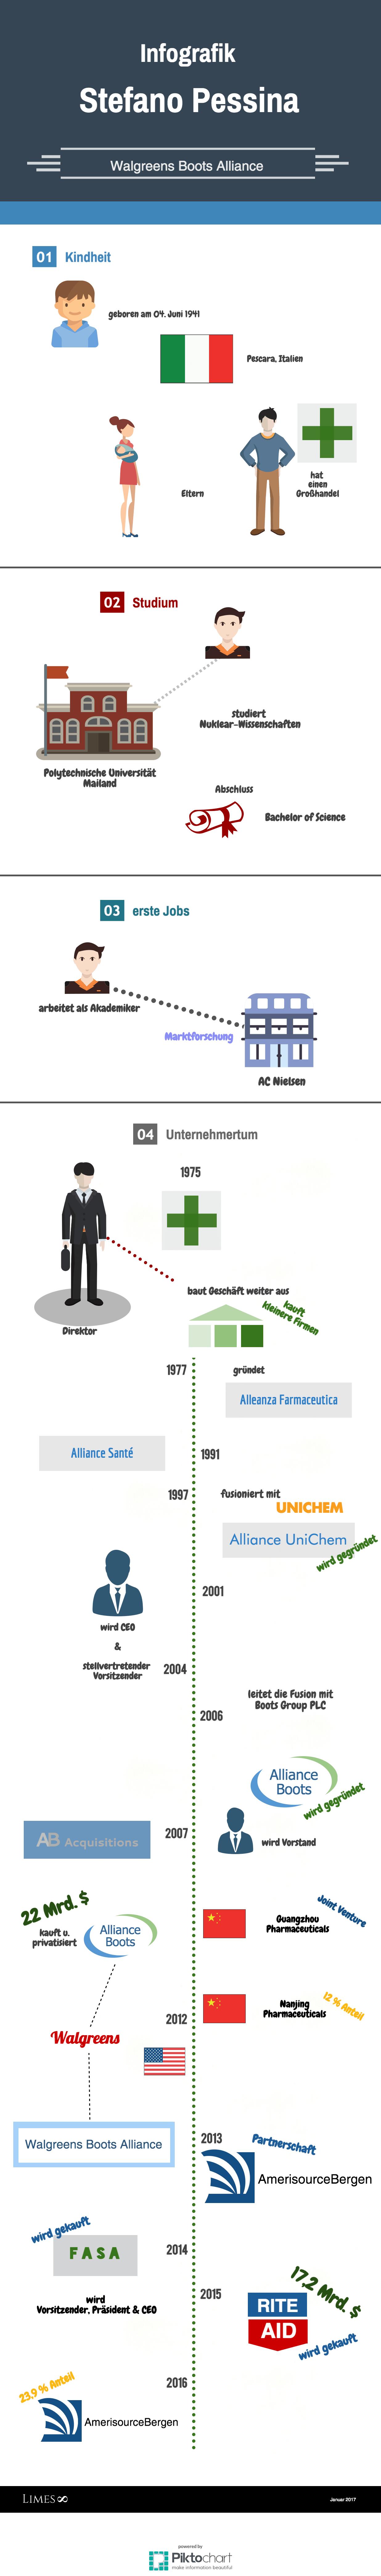 Informaionsgrafik der Pharma Milliardärs Stefano Pessina